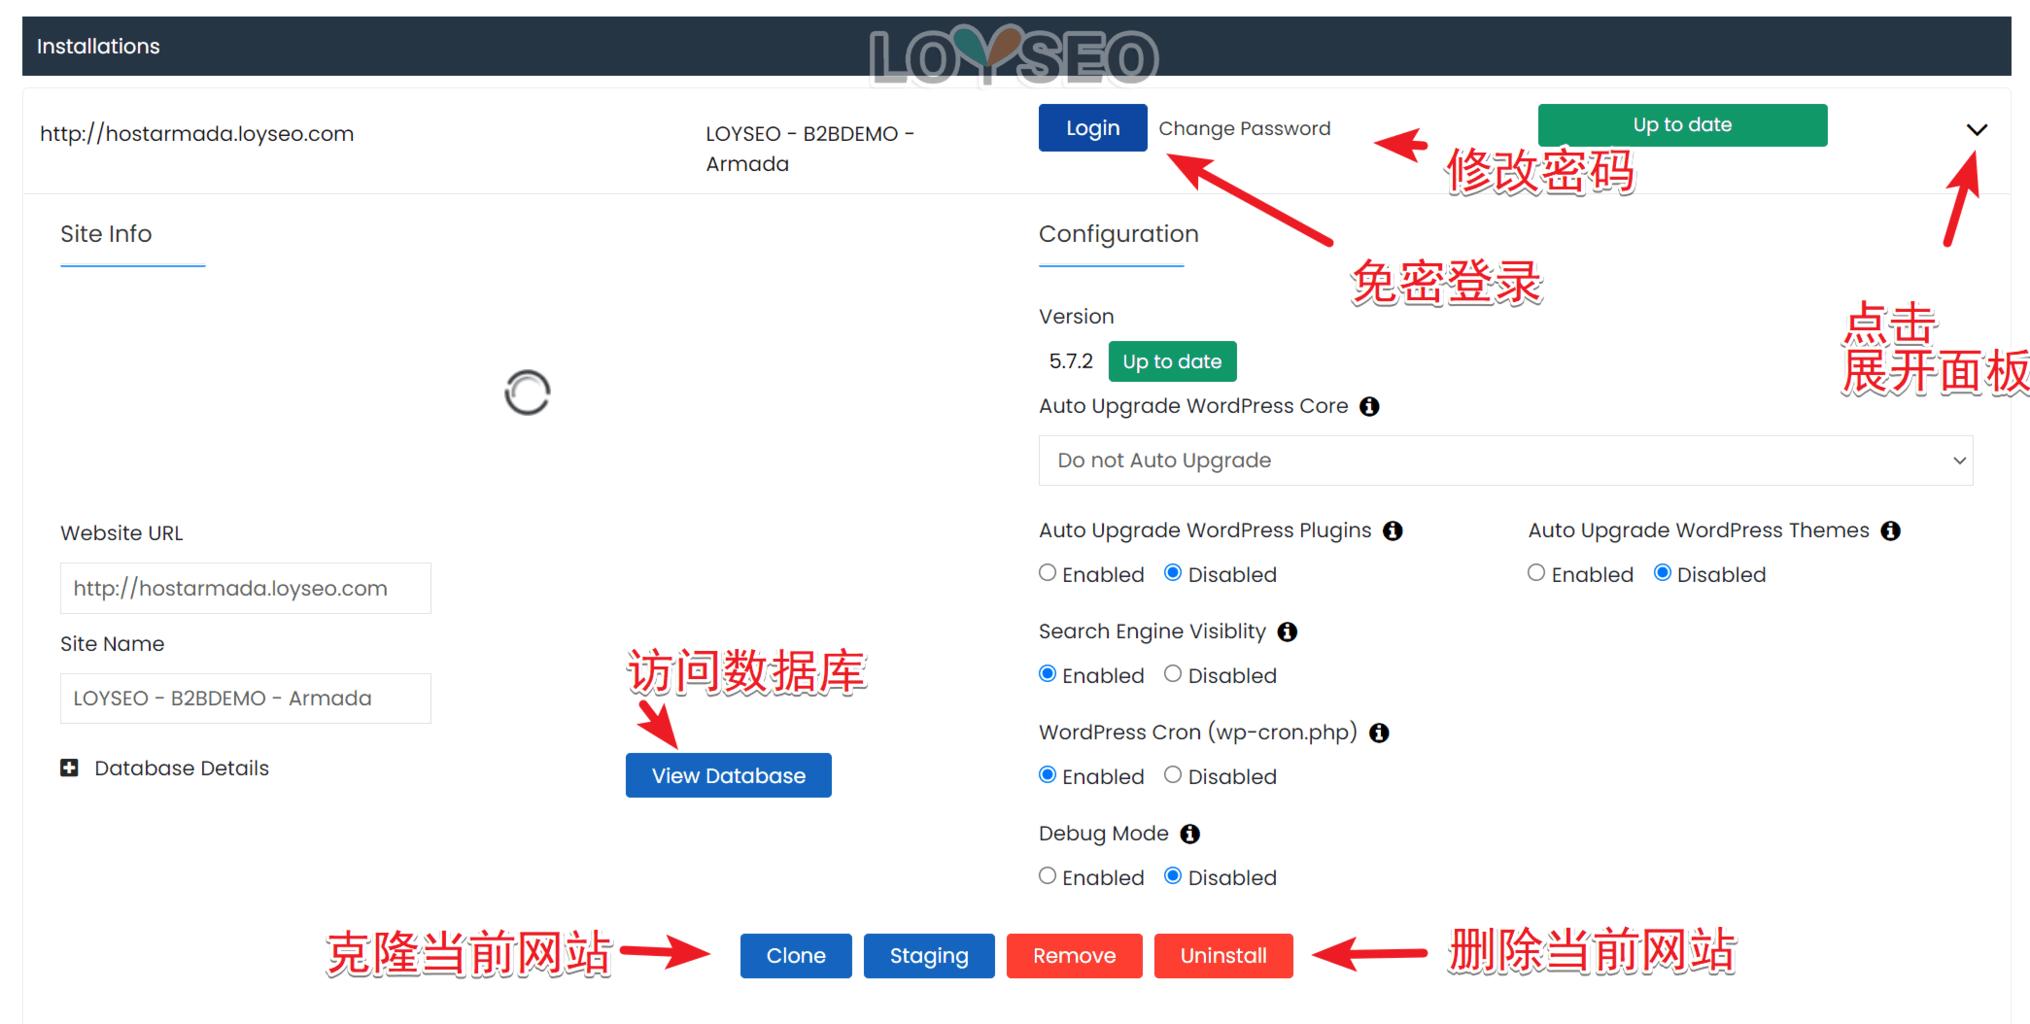 install wordpress in hostarmada 1 - Hostarmada主机:优惠购买攻略、建站教程与速度评测